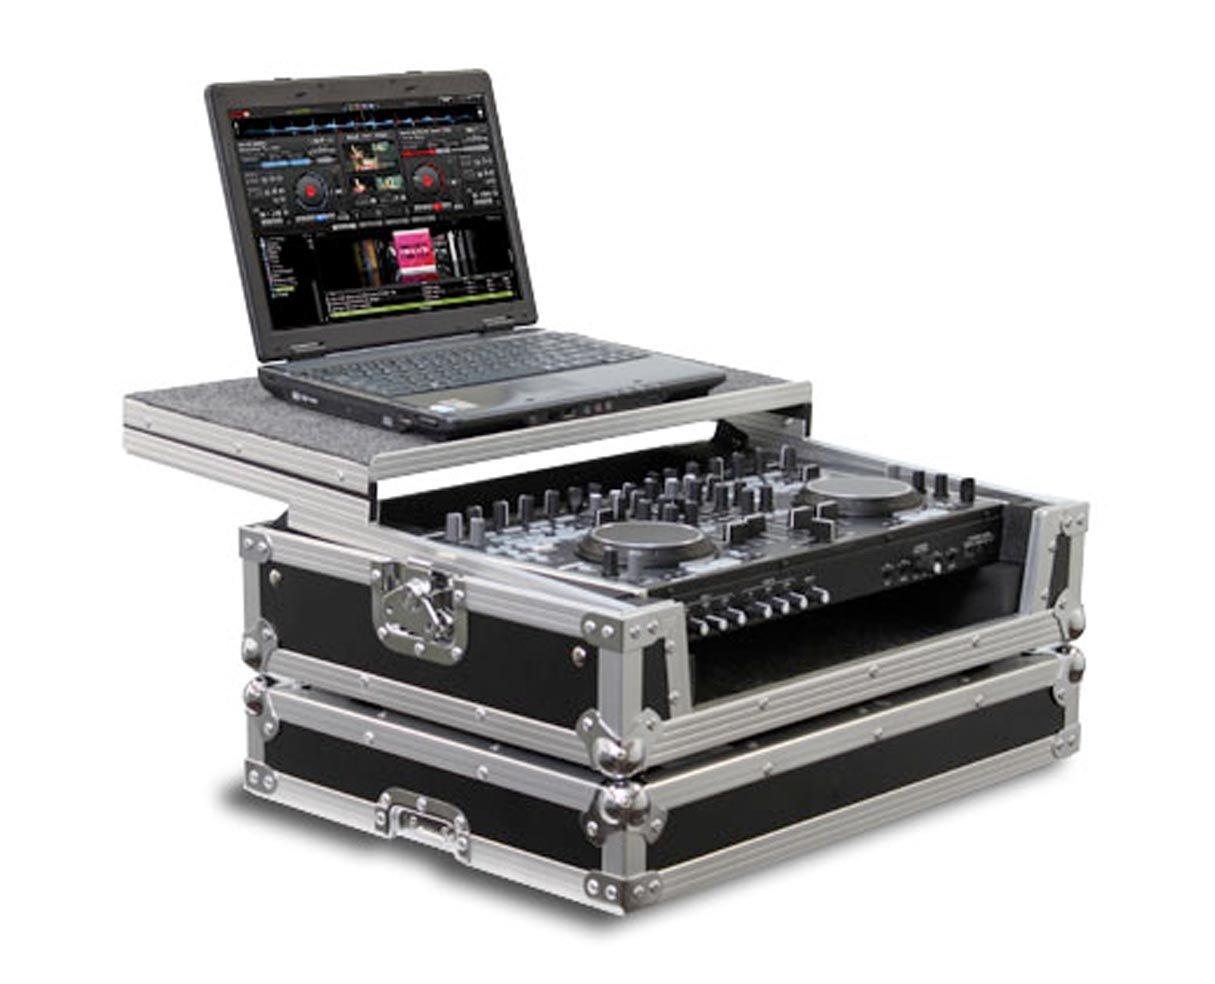 Odyssey FRGSDNMC36000 DJ Mixer Case Odyssey Innovative Designs